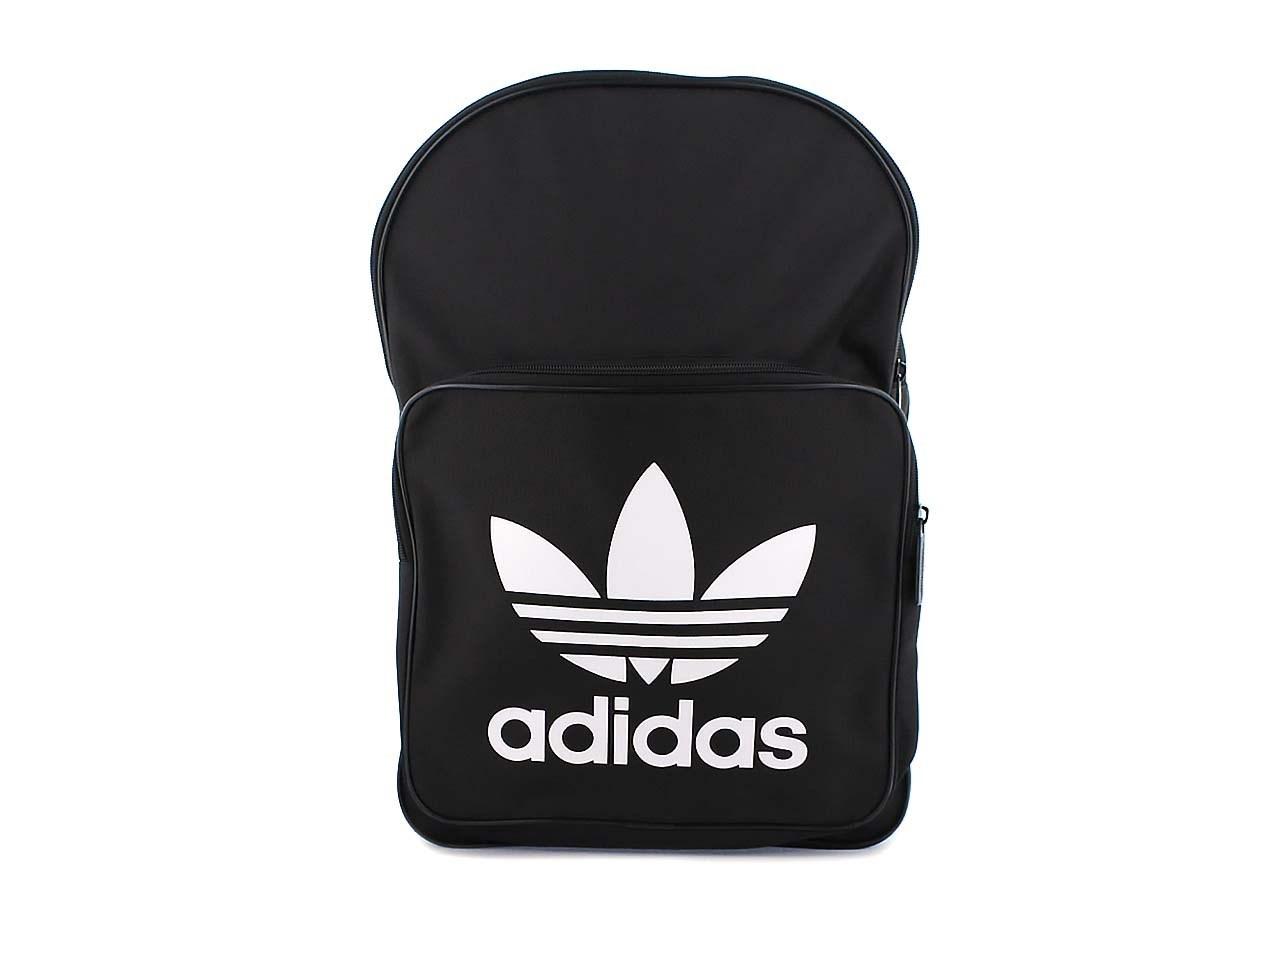 adidas väska herr ryggsäck